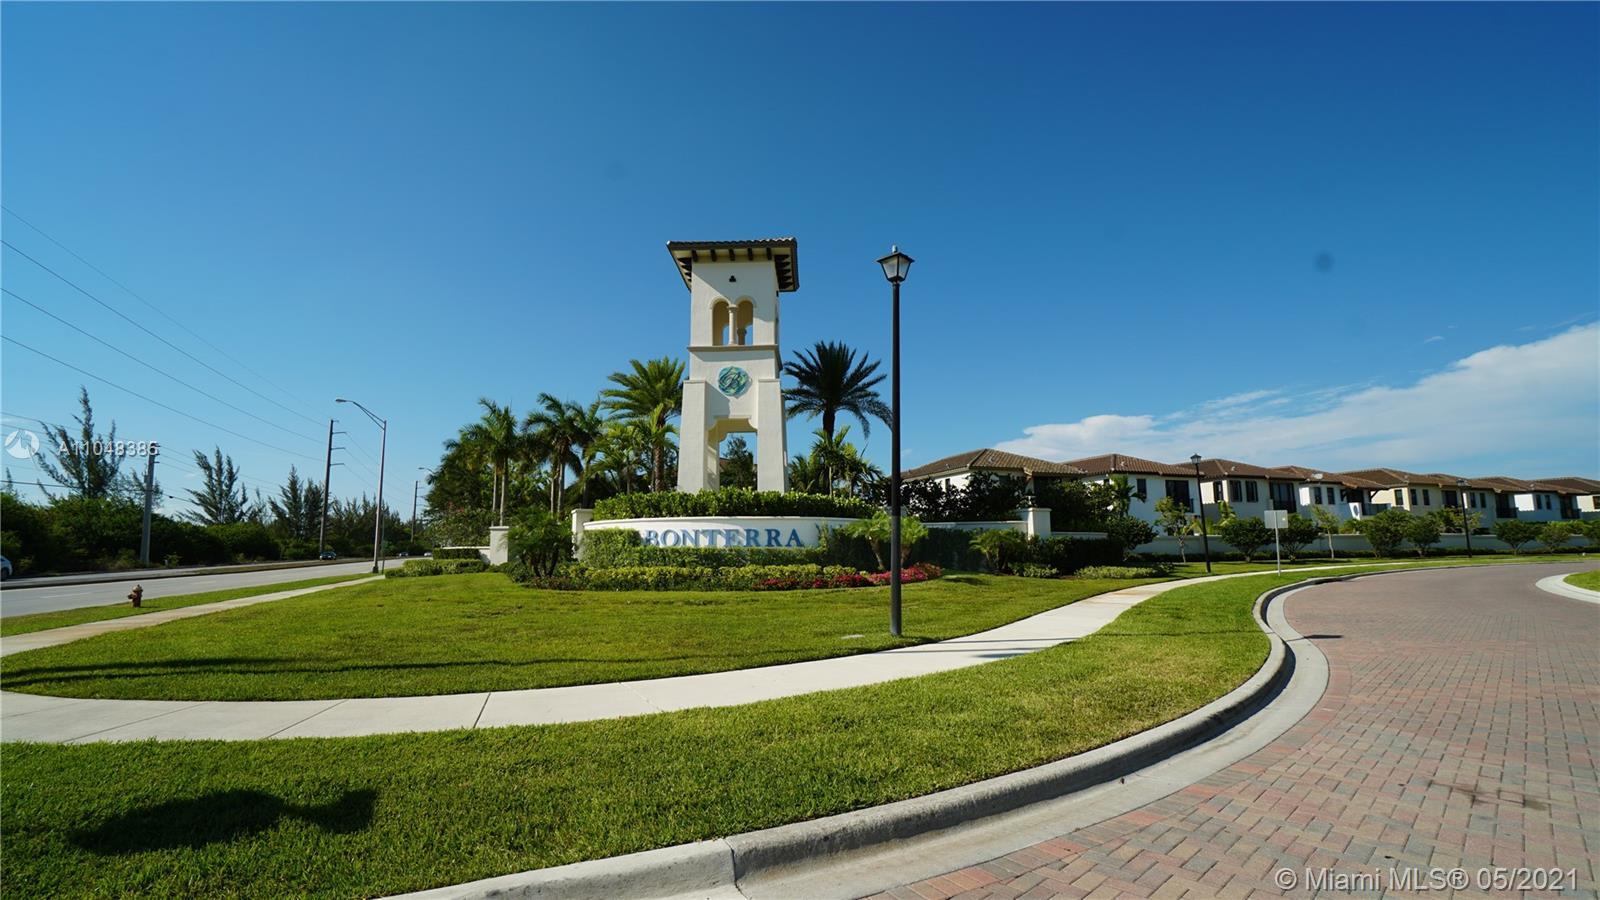 Bonterra - 9387 W 32nd Ln, Hialeah, FL 33018